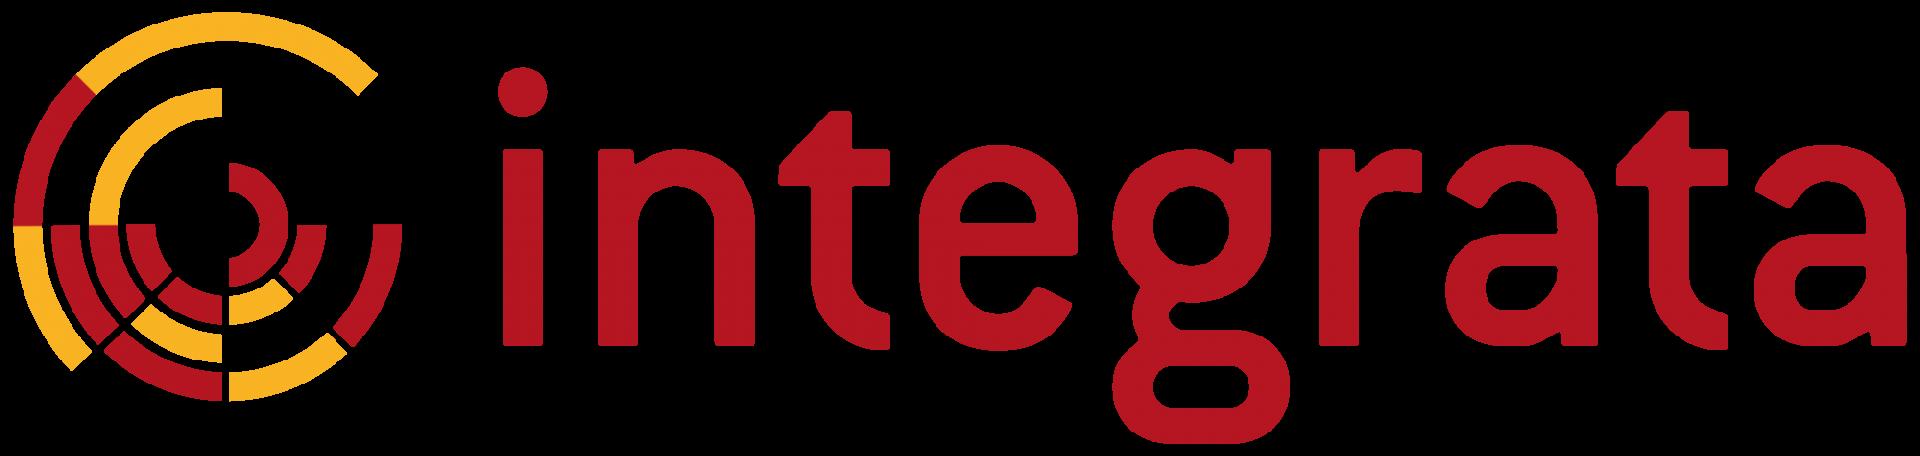 2000px-integrata_logo-svg